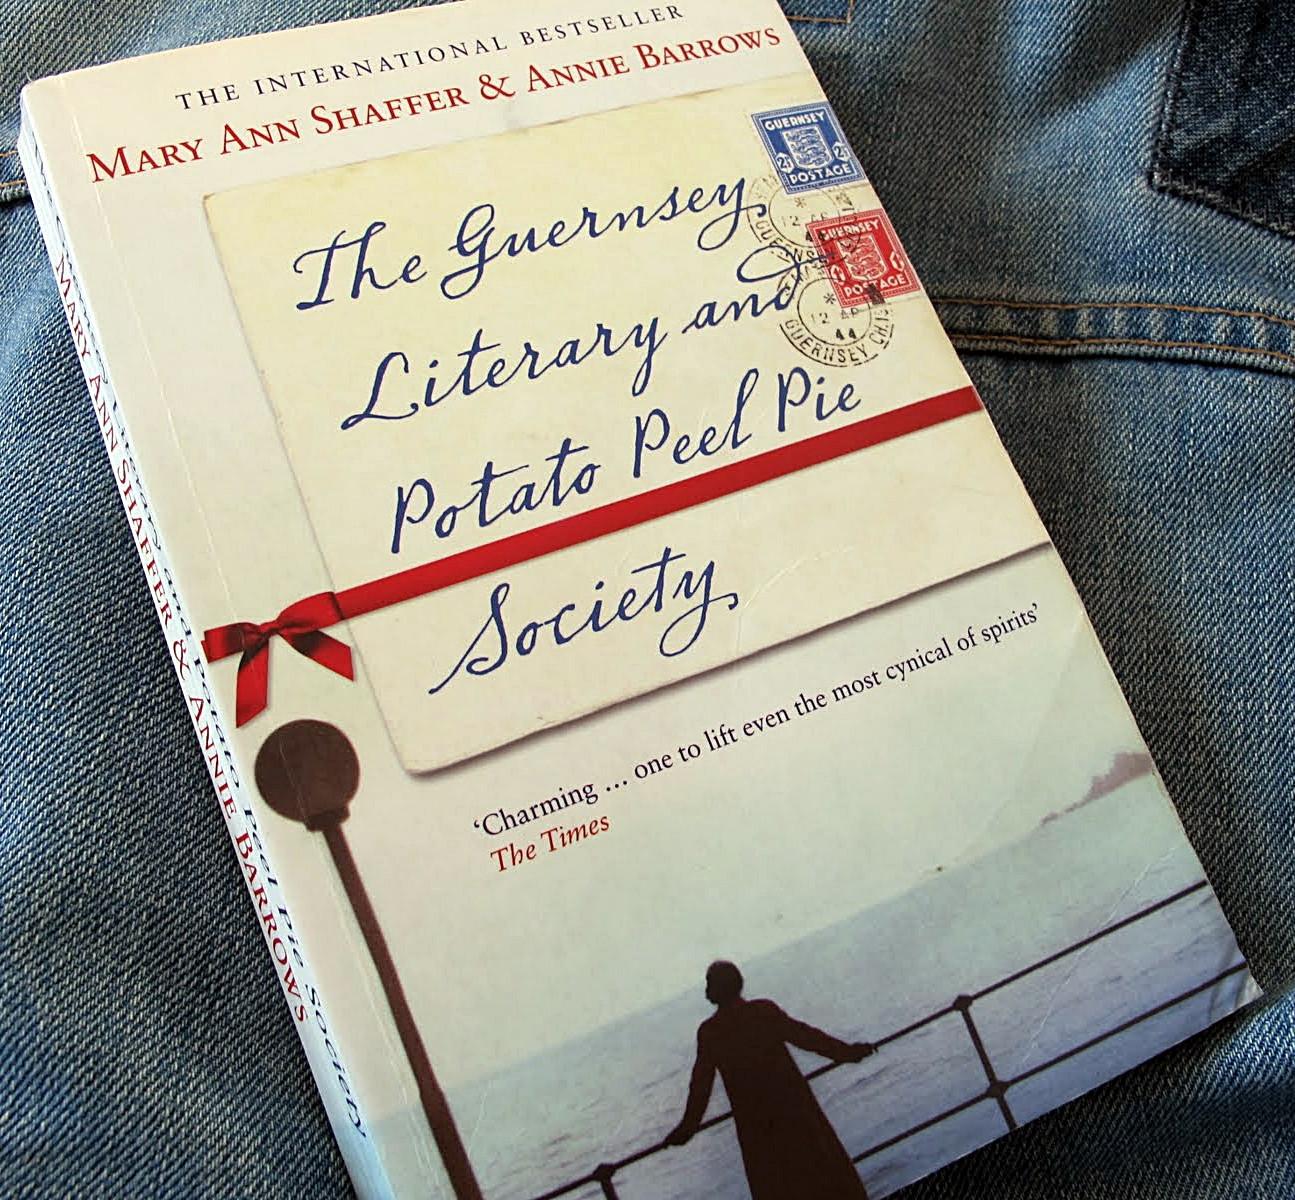 Guernsey Literary And Potato Peel Pie Society  Mail Adventures The Guernsey Literary and Potato Peel Pie